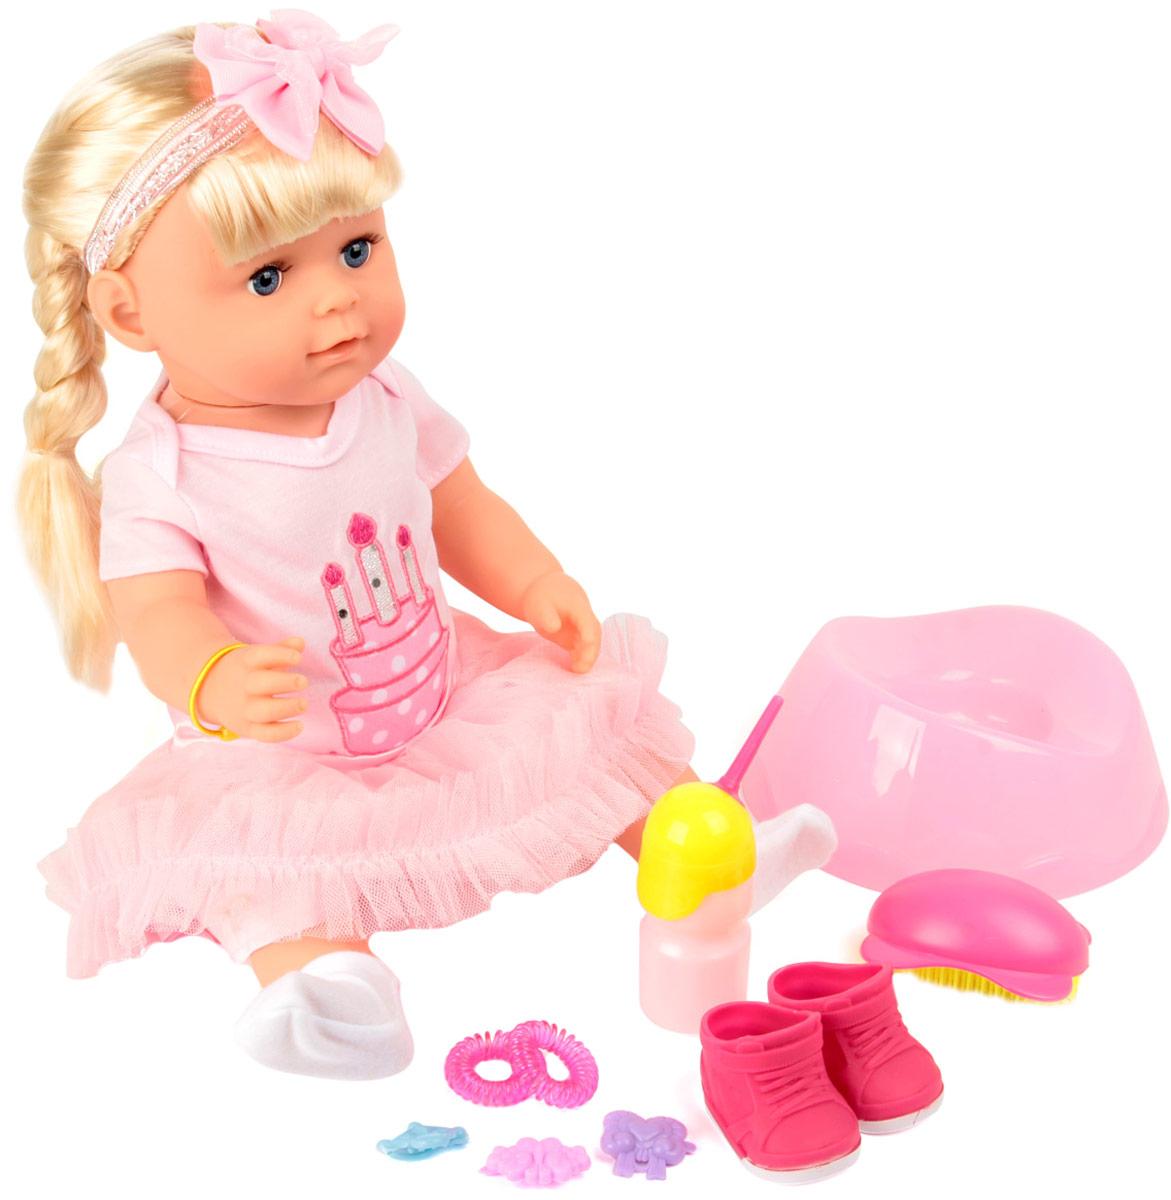 Lisa Jane Кукла Марина 46 см кукла интерактивная lisa jane mami в розовом 40 см